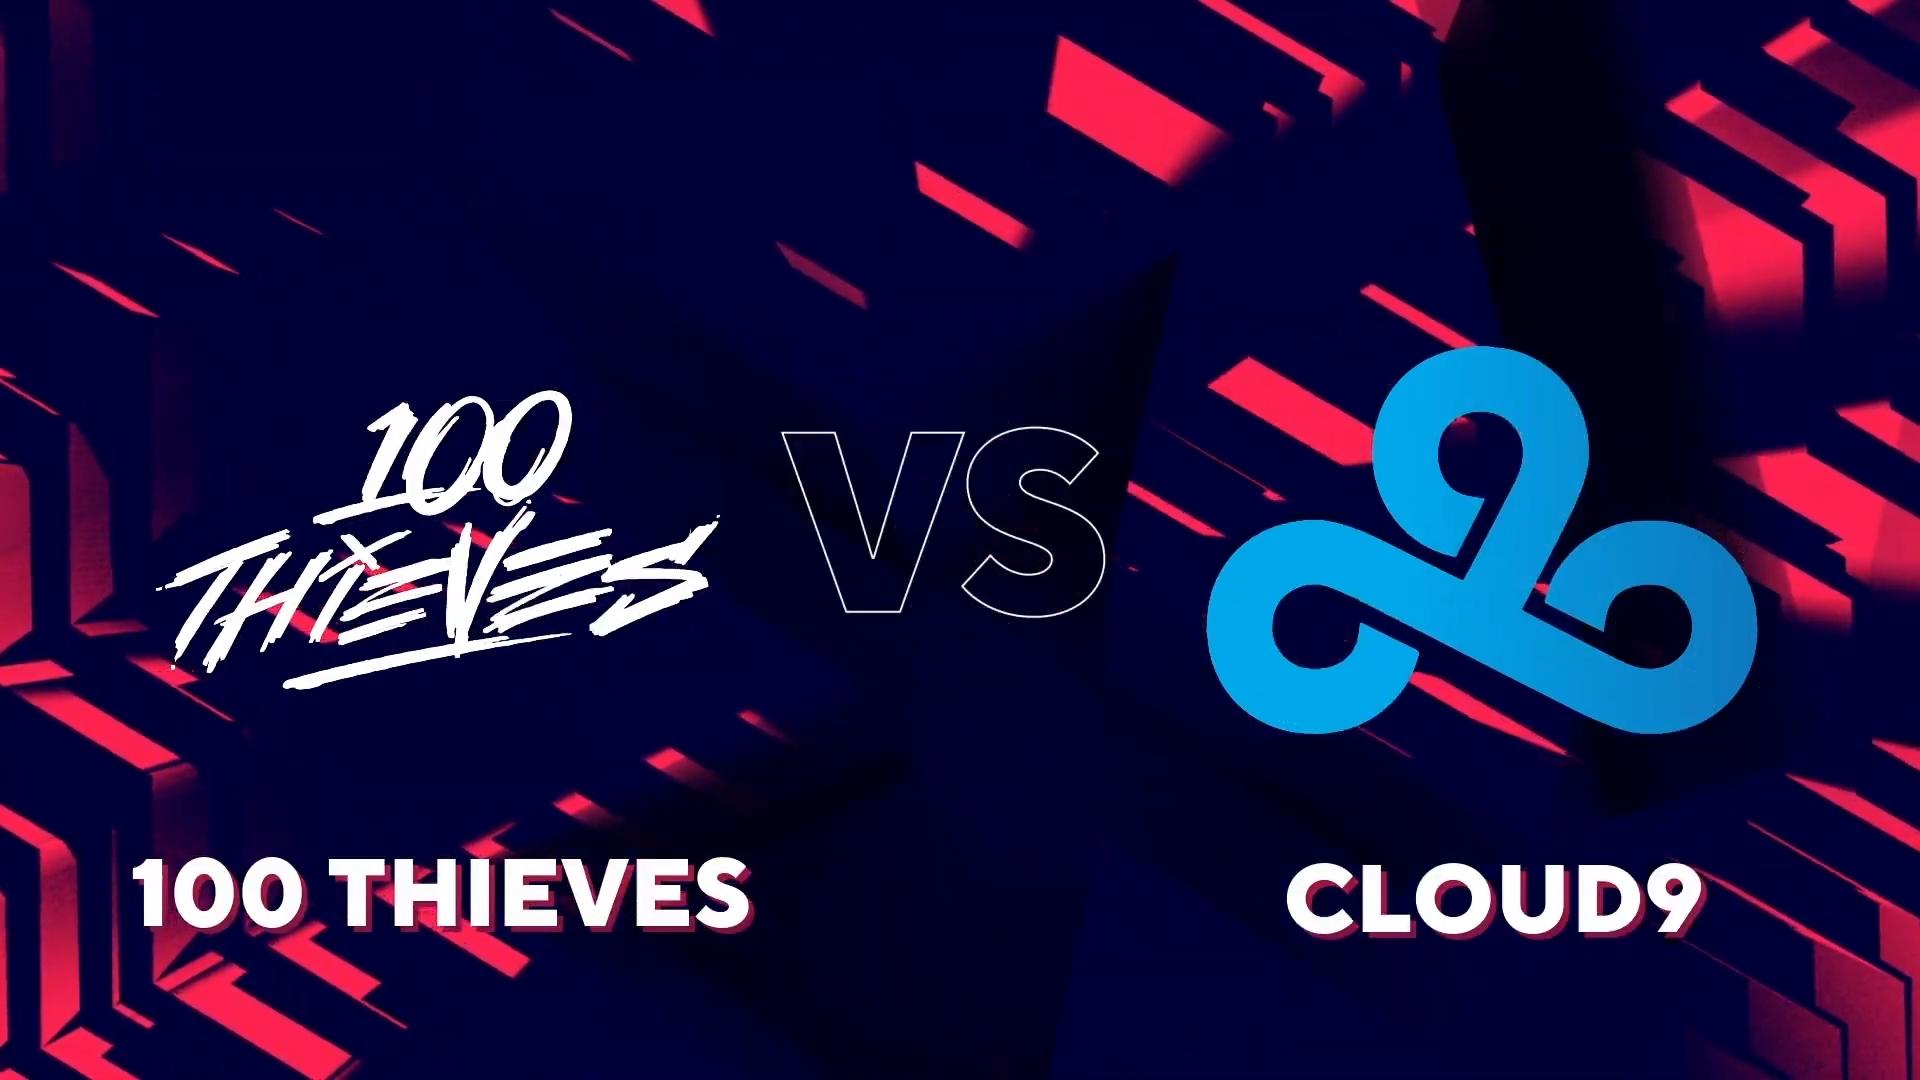 Cloud9 mount comeback, eliminate 100 Thieves from BLAST Premier Spring American Showdown